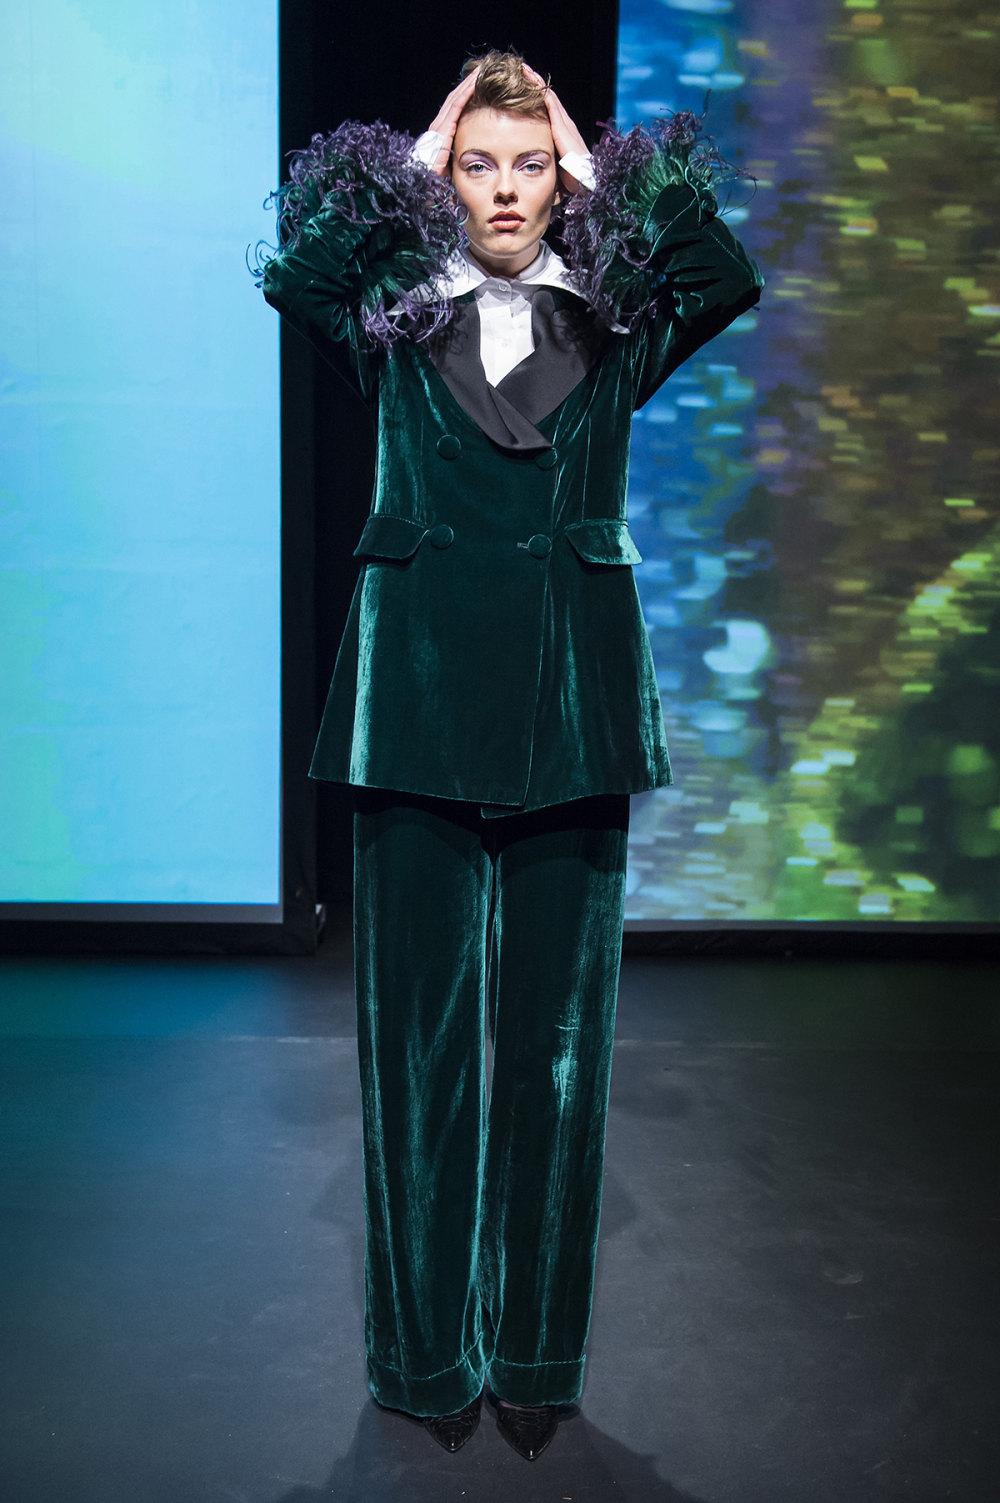 16Arlington时装系列标志性的時尚单色西装外还有更大胆的版本-14.jpg